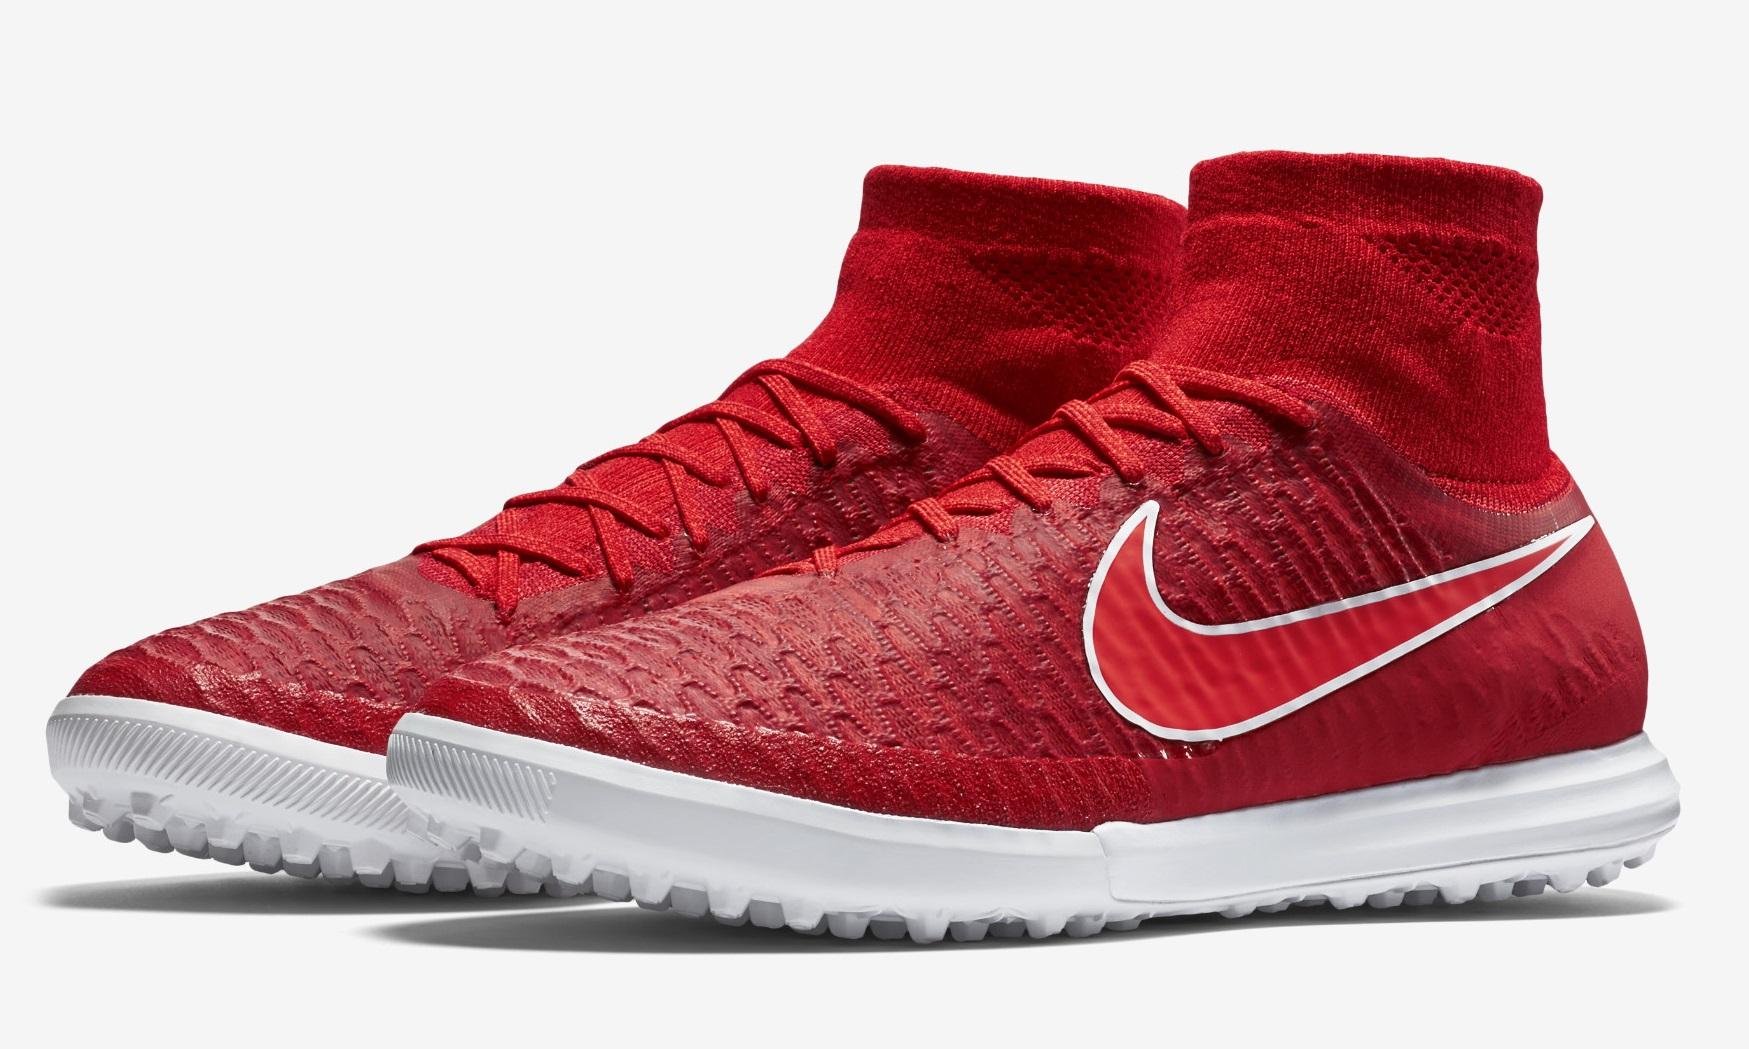 Nike MagistaX Proximo Challange Red voetbalschoenen 2015